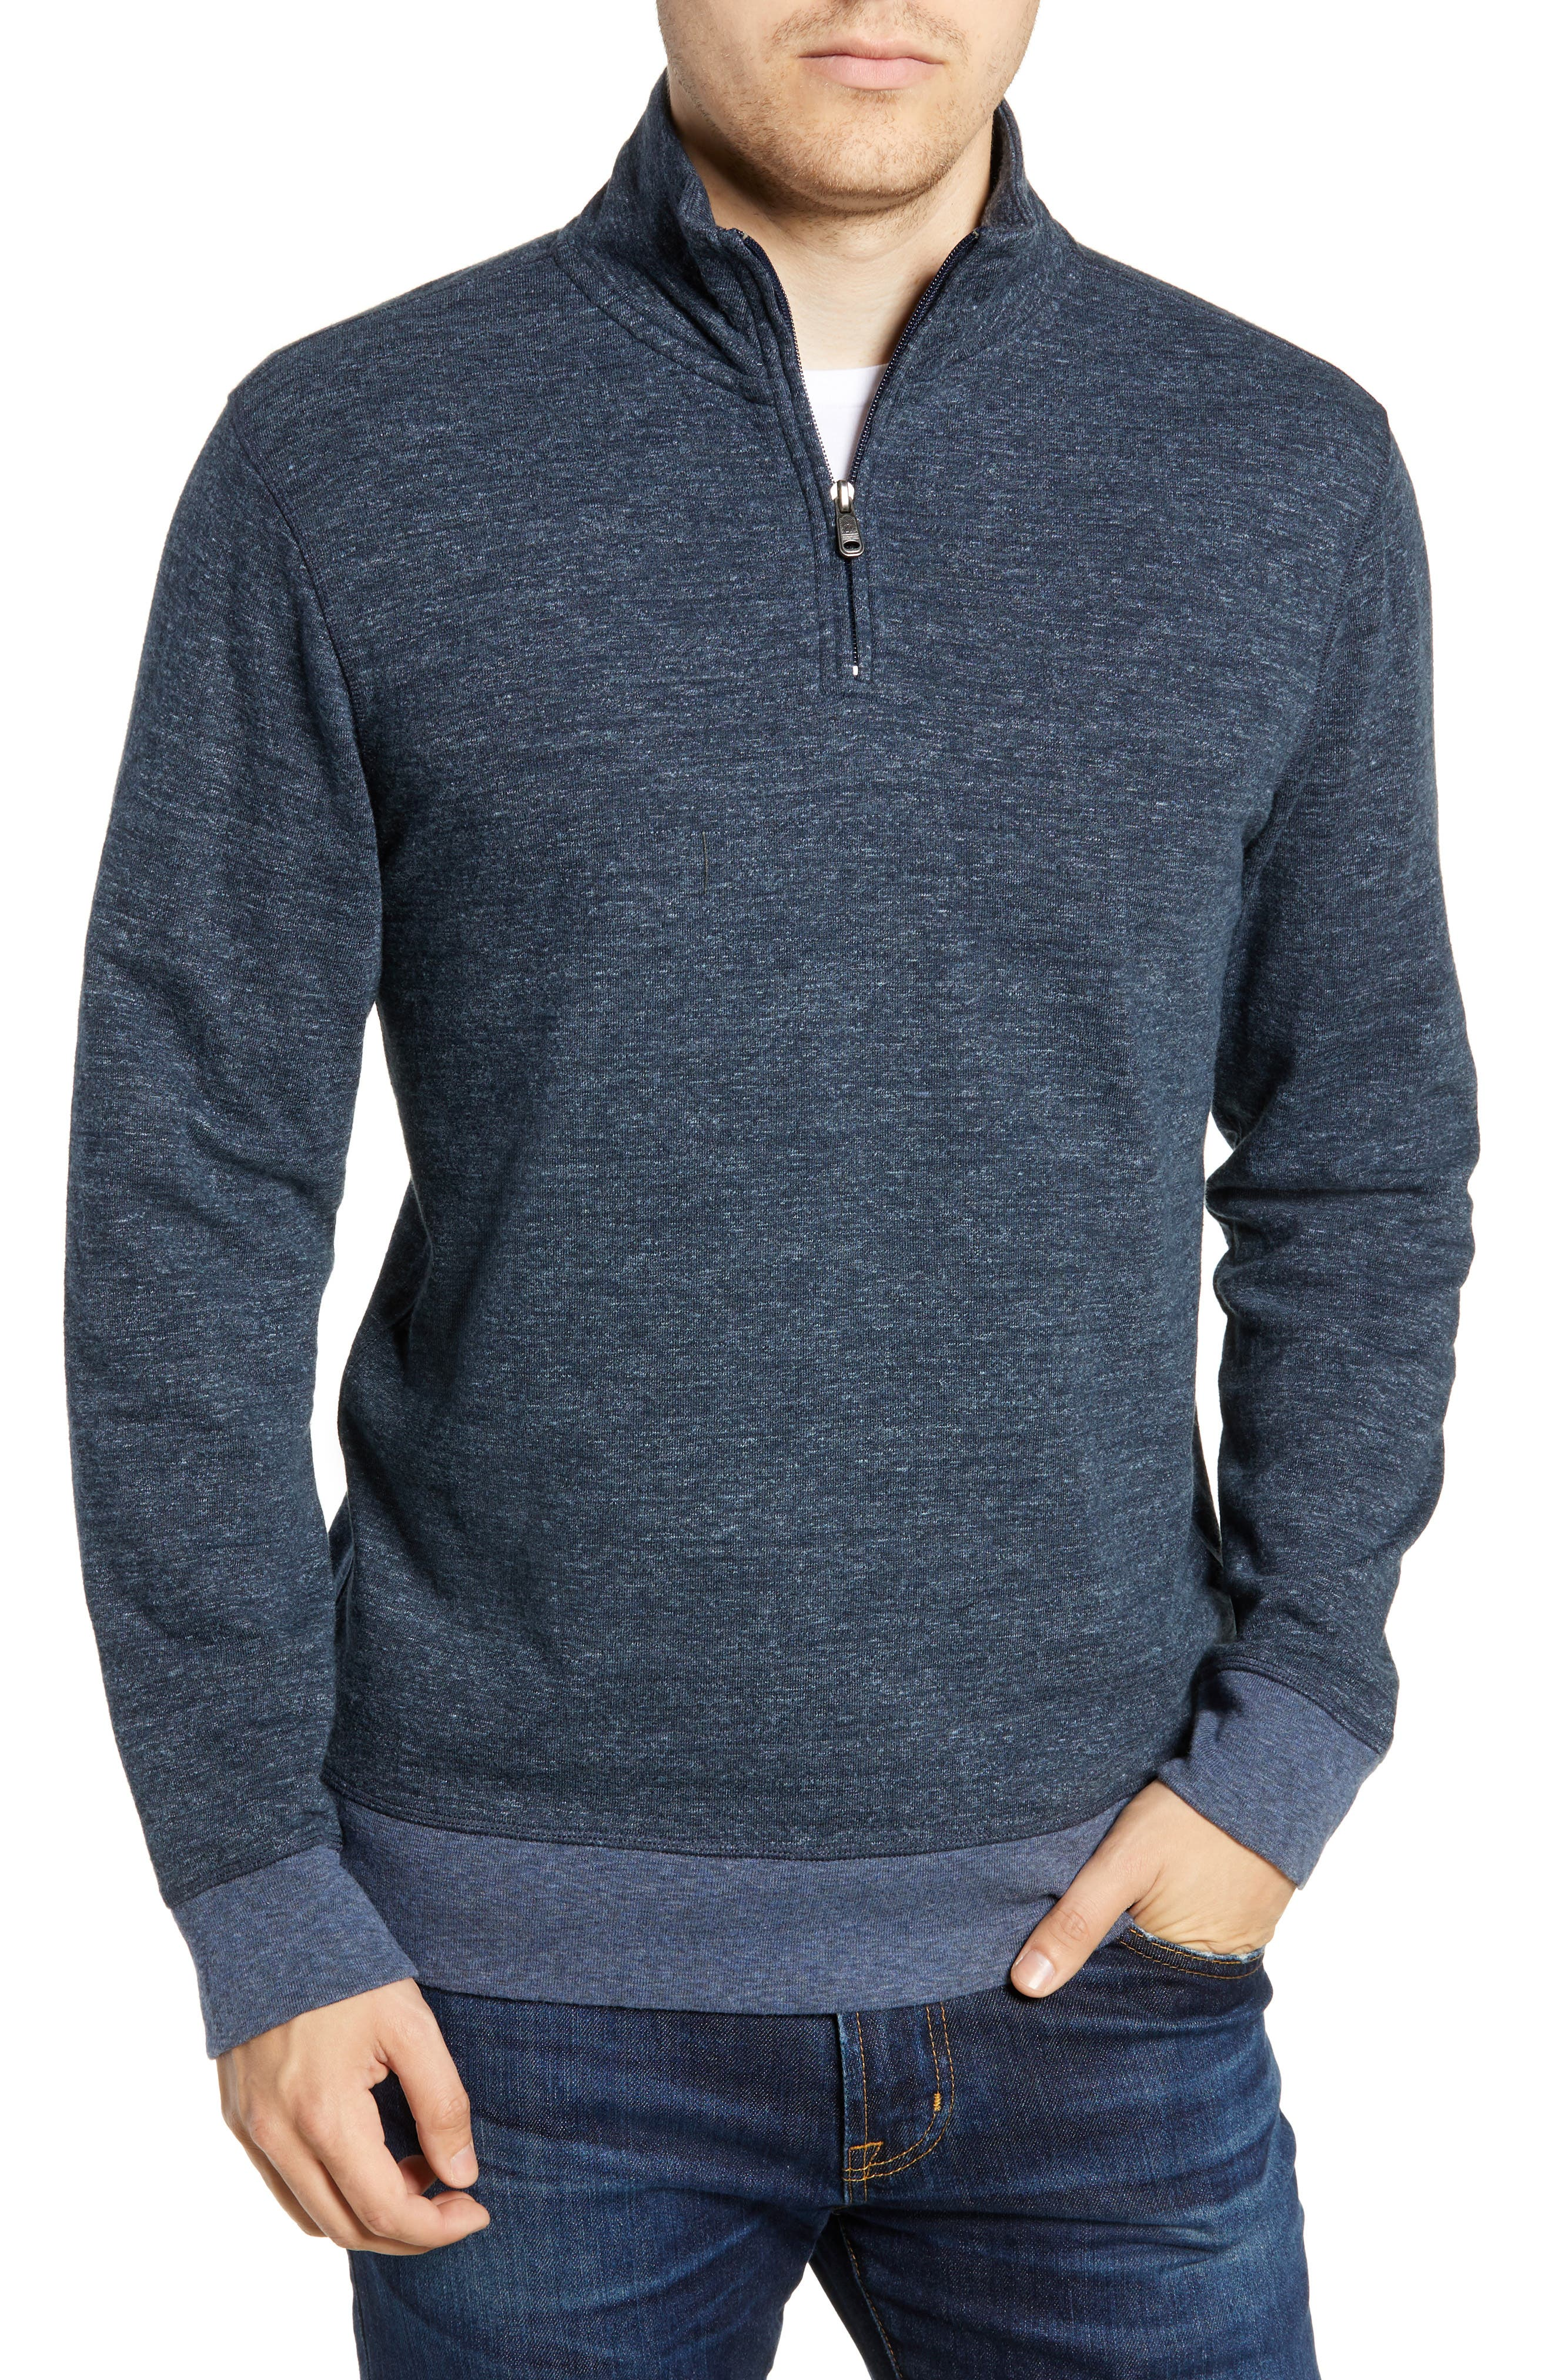 Faherty Brand Dual Knit Regular Fit Quarter Zip Pullover